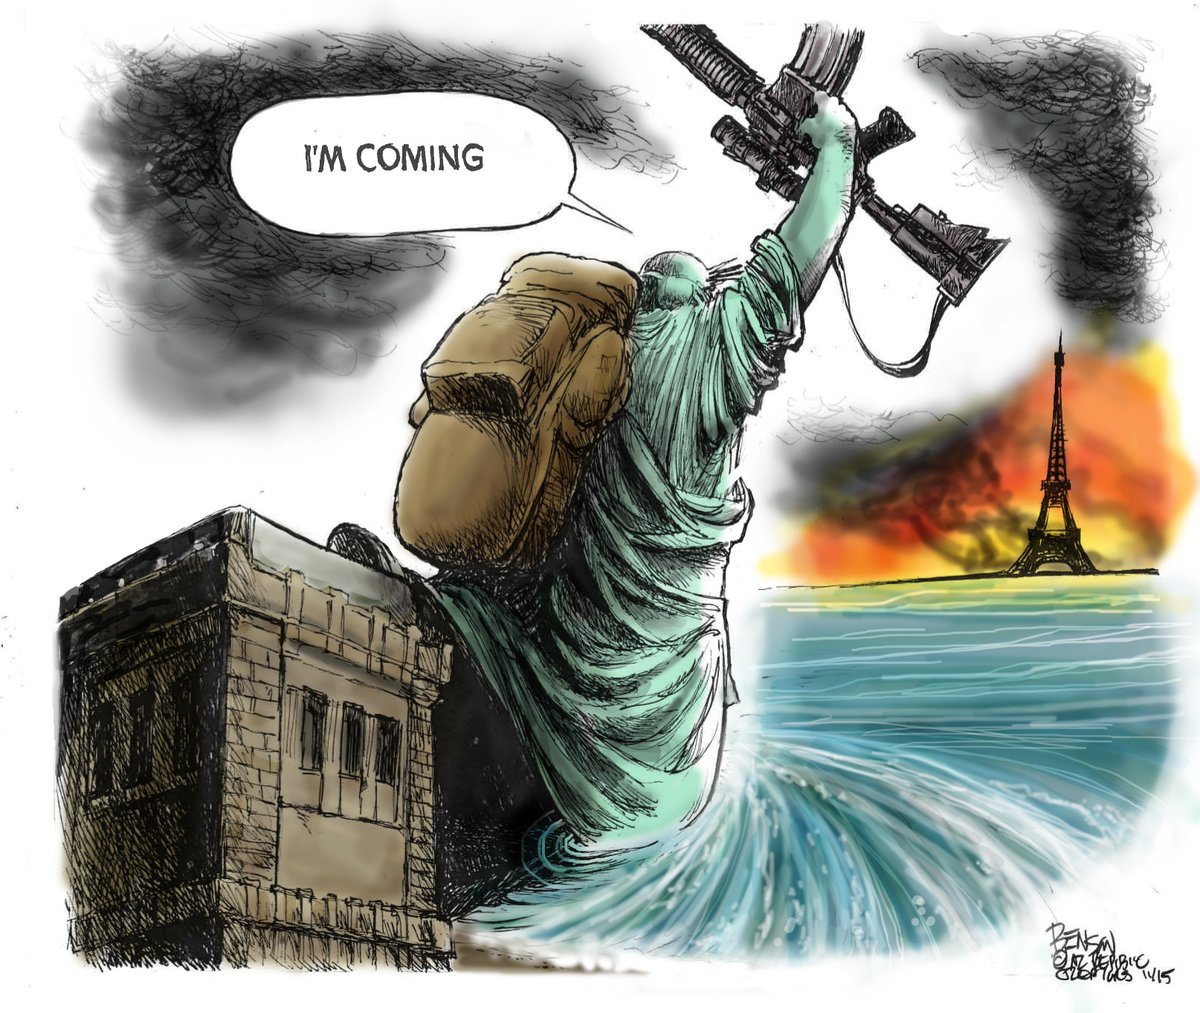 The Arizona Republic's Steve Benson on the Paris terror attacks. https://t.co/neURbwsFtu